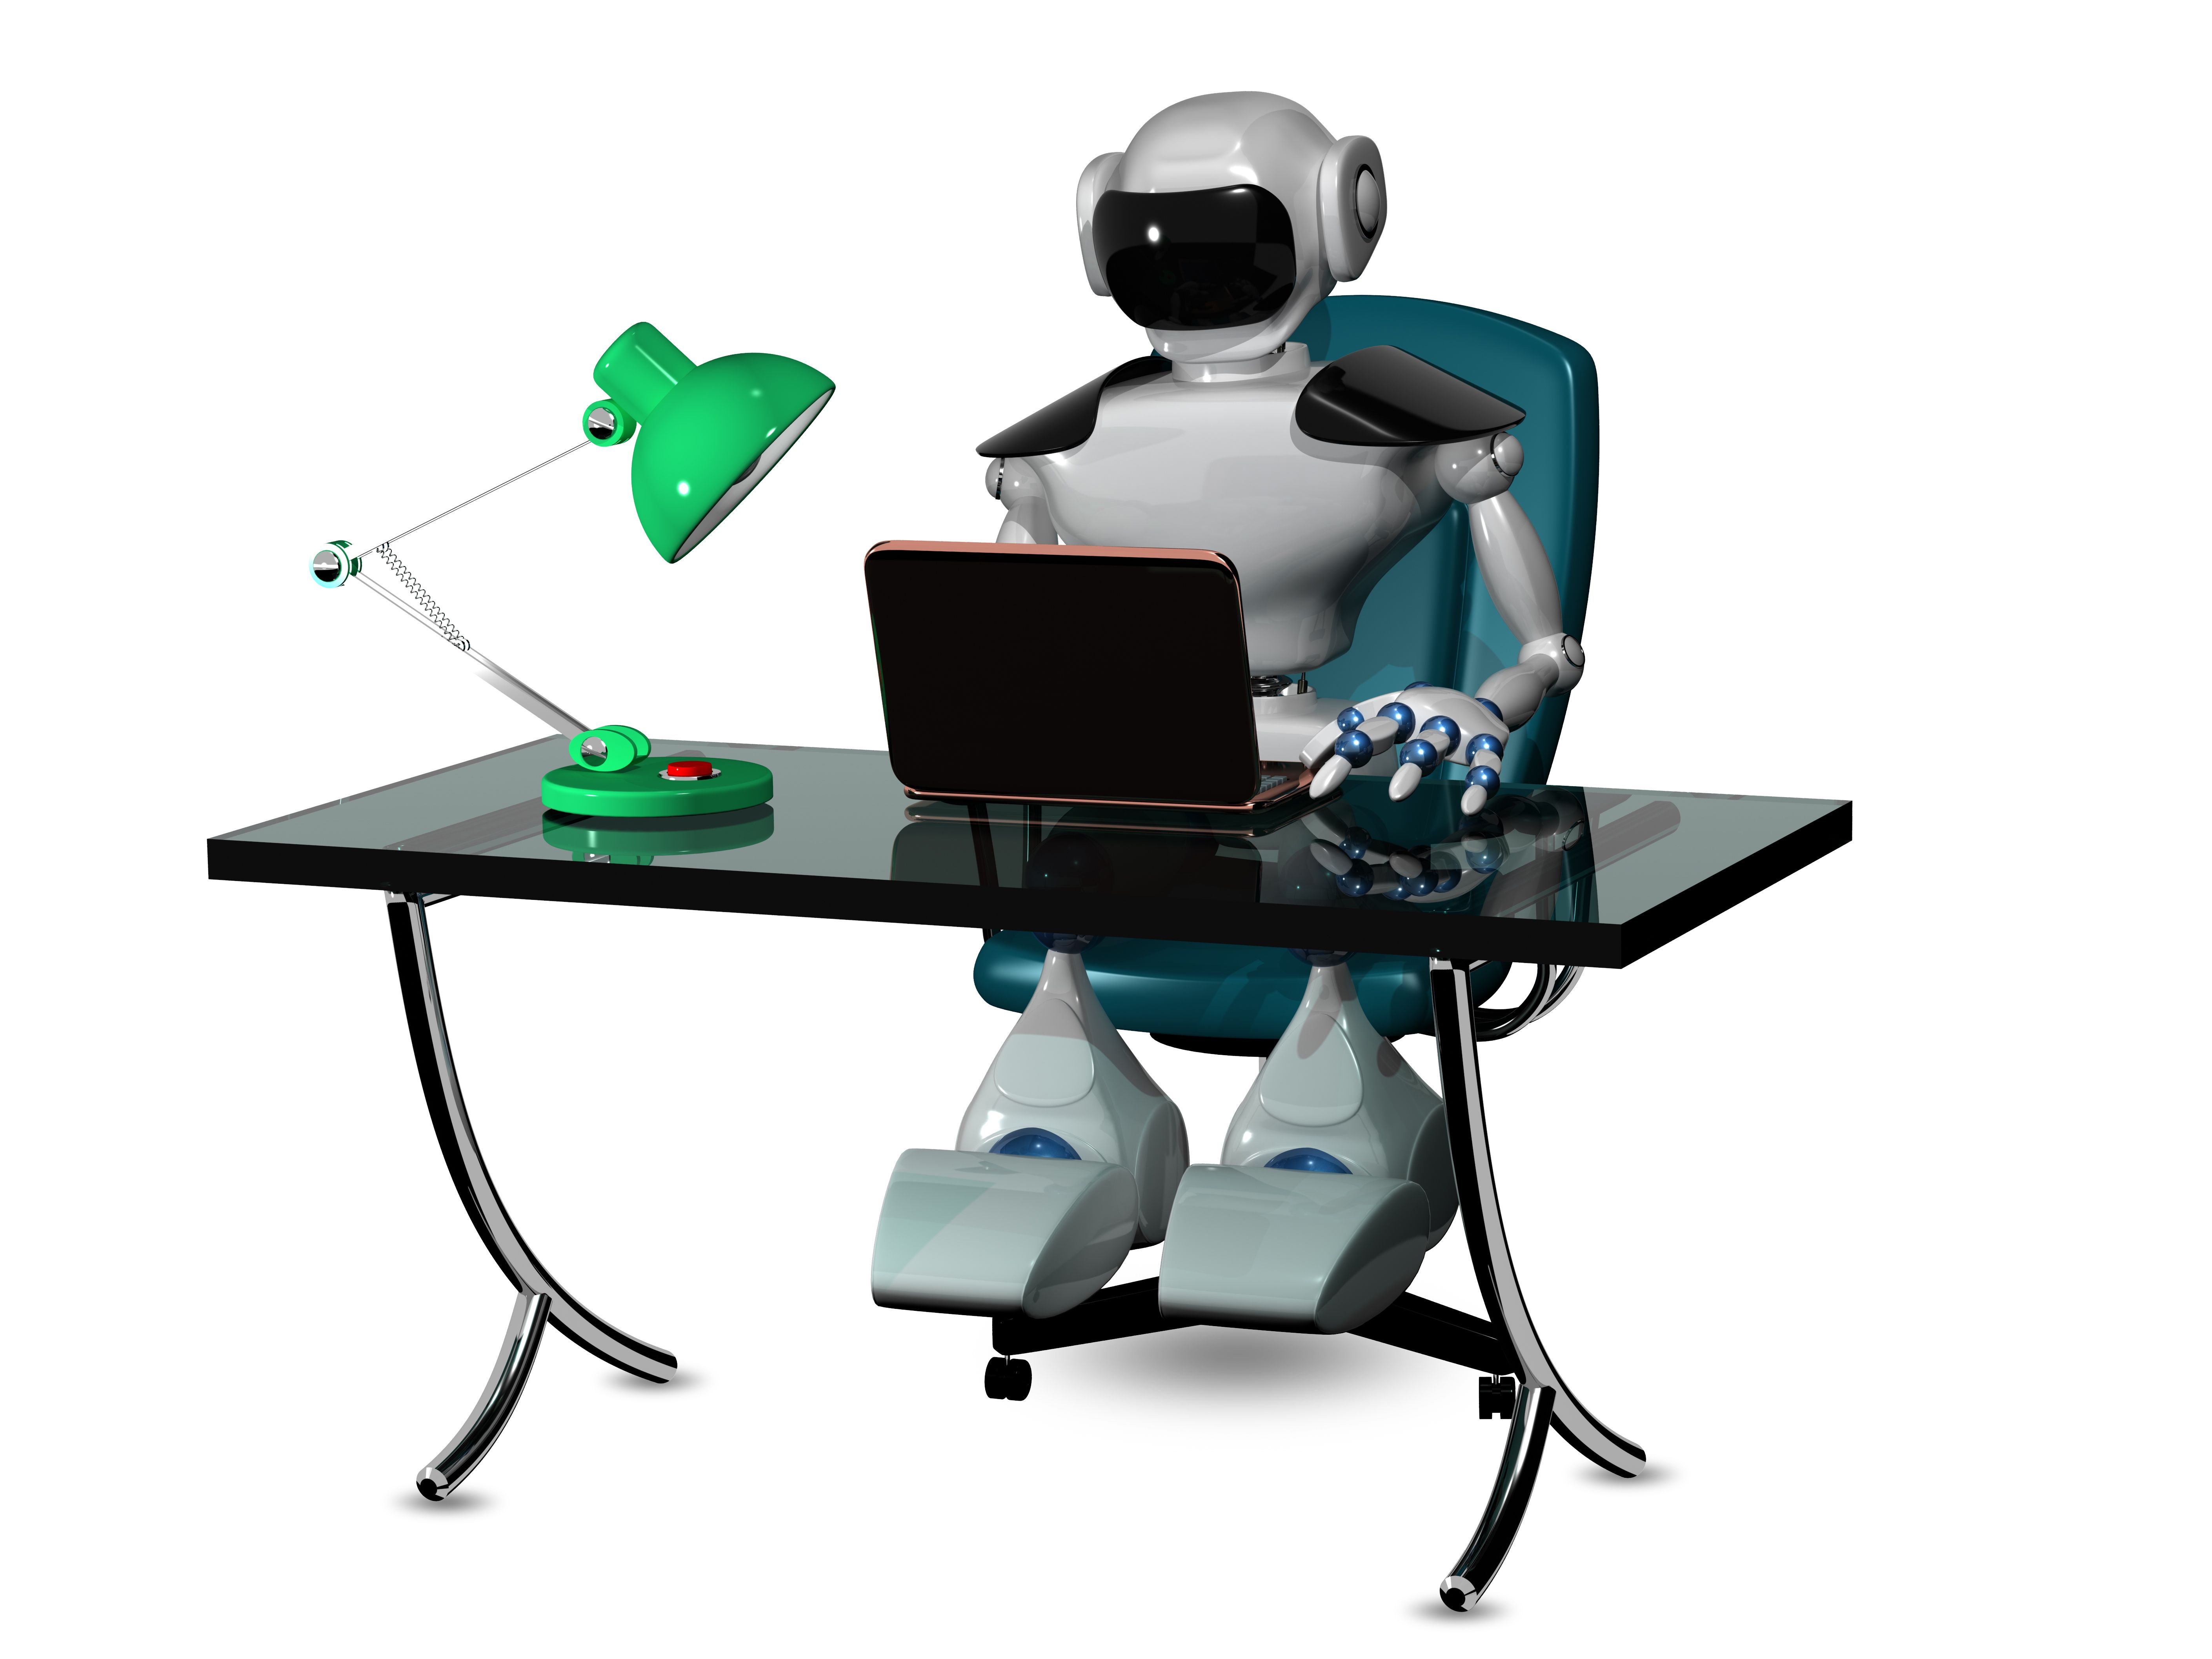 Robots Robs Human Jobs At RBS